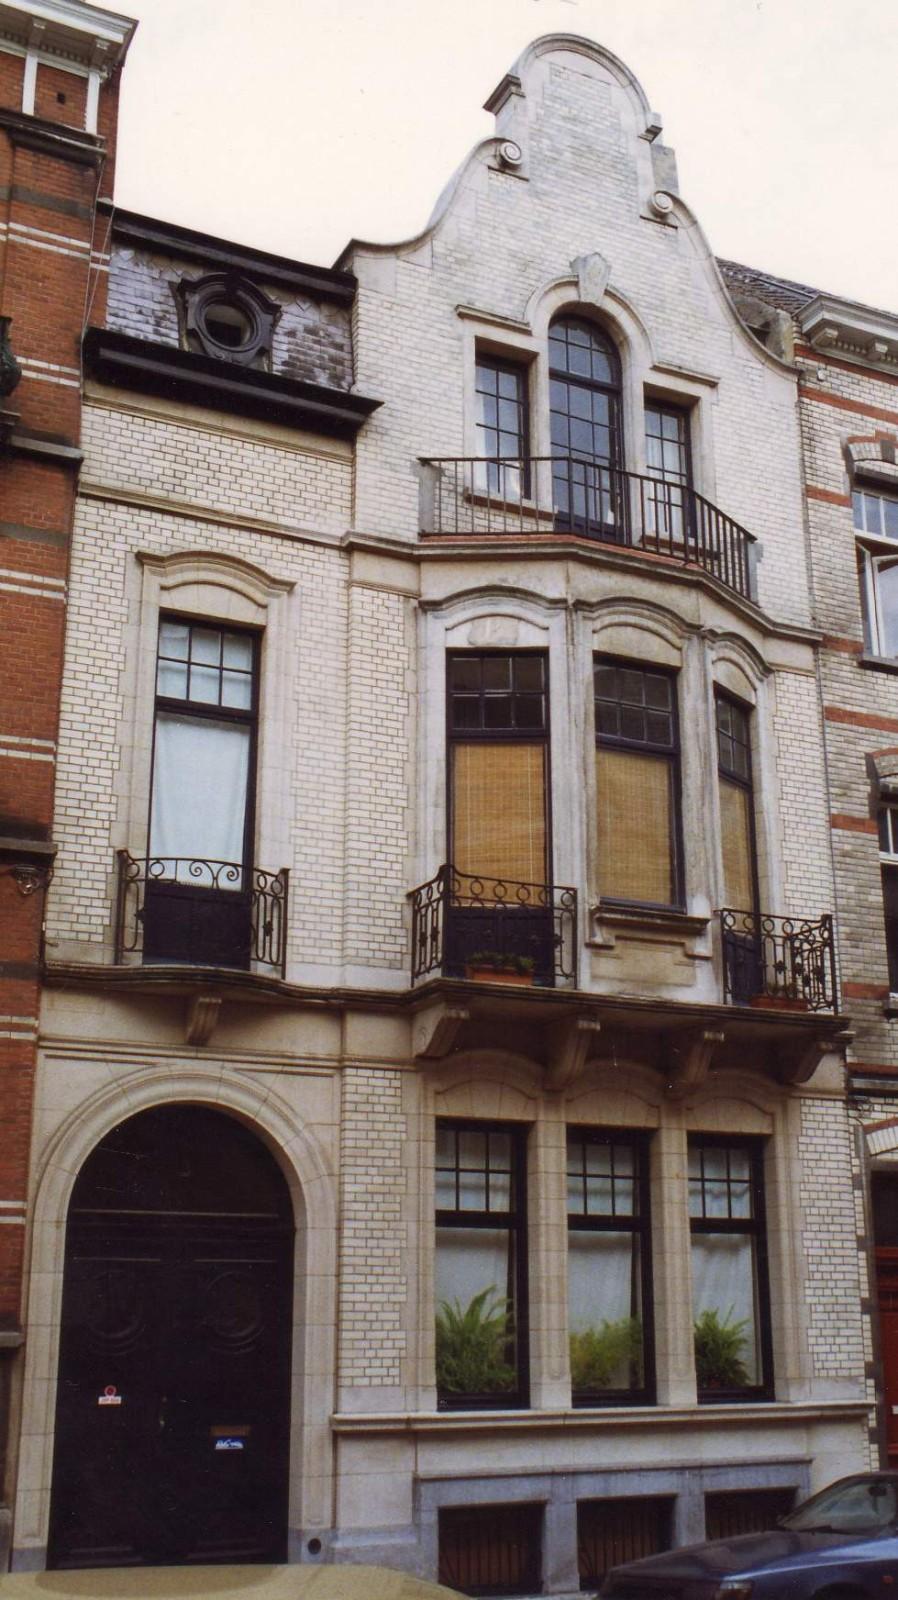 Rue Peter Benoit 17., 1993